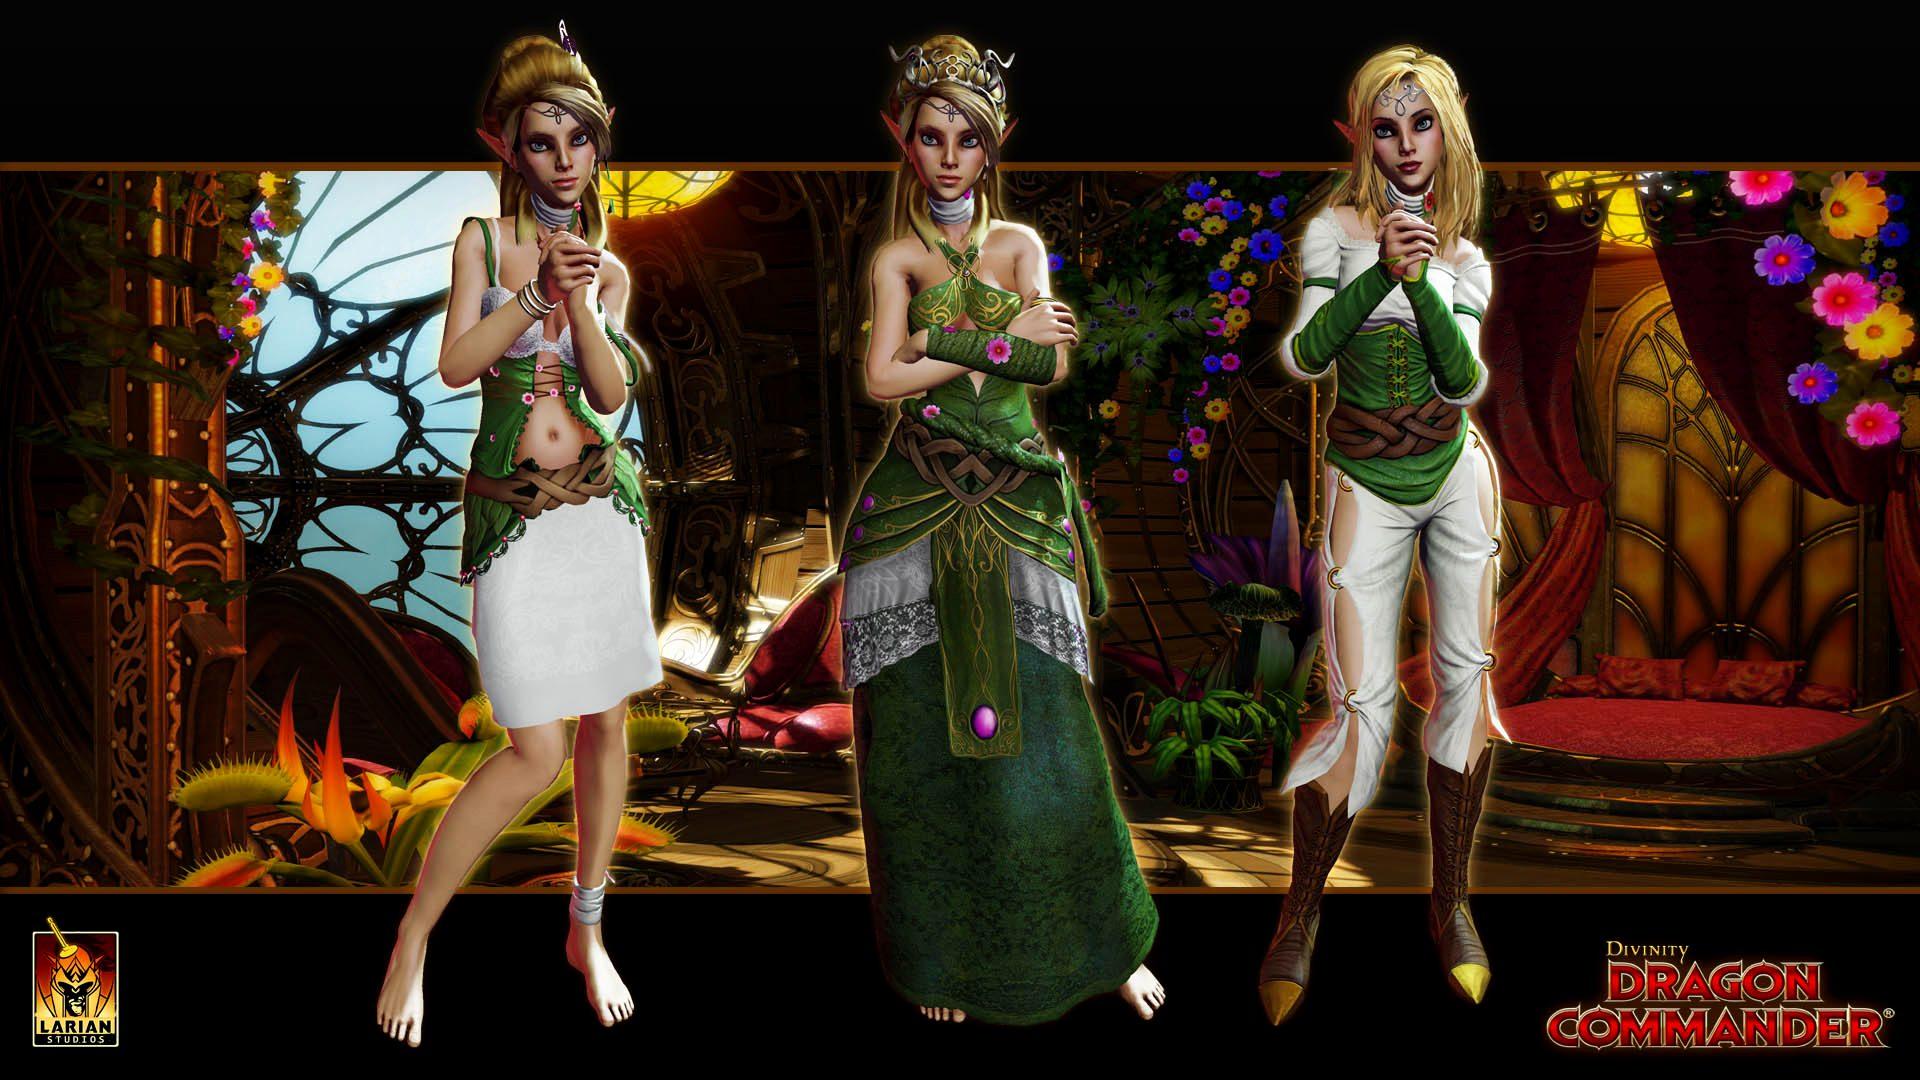 divinity dragon commander multiplayer crack